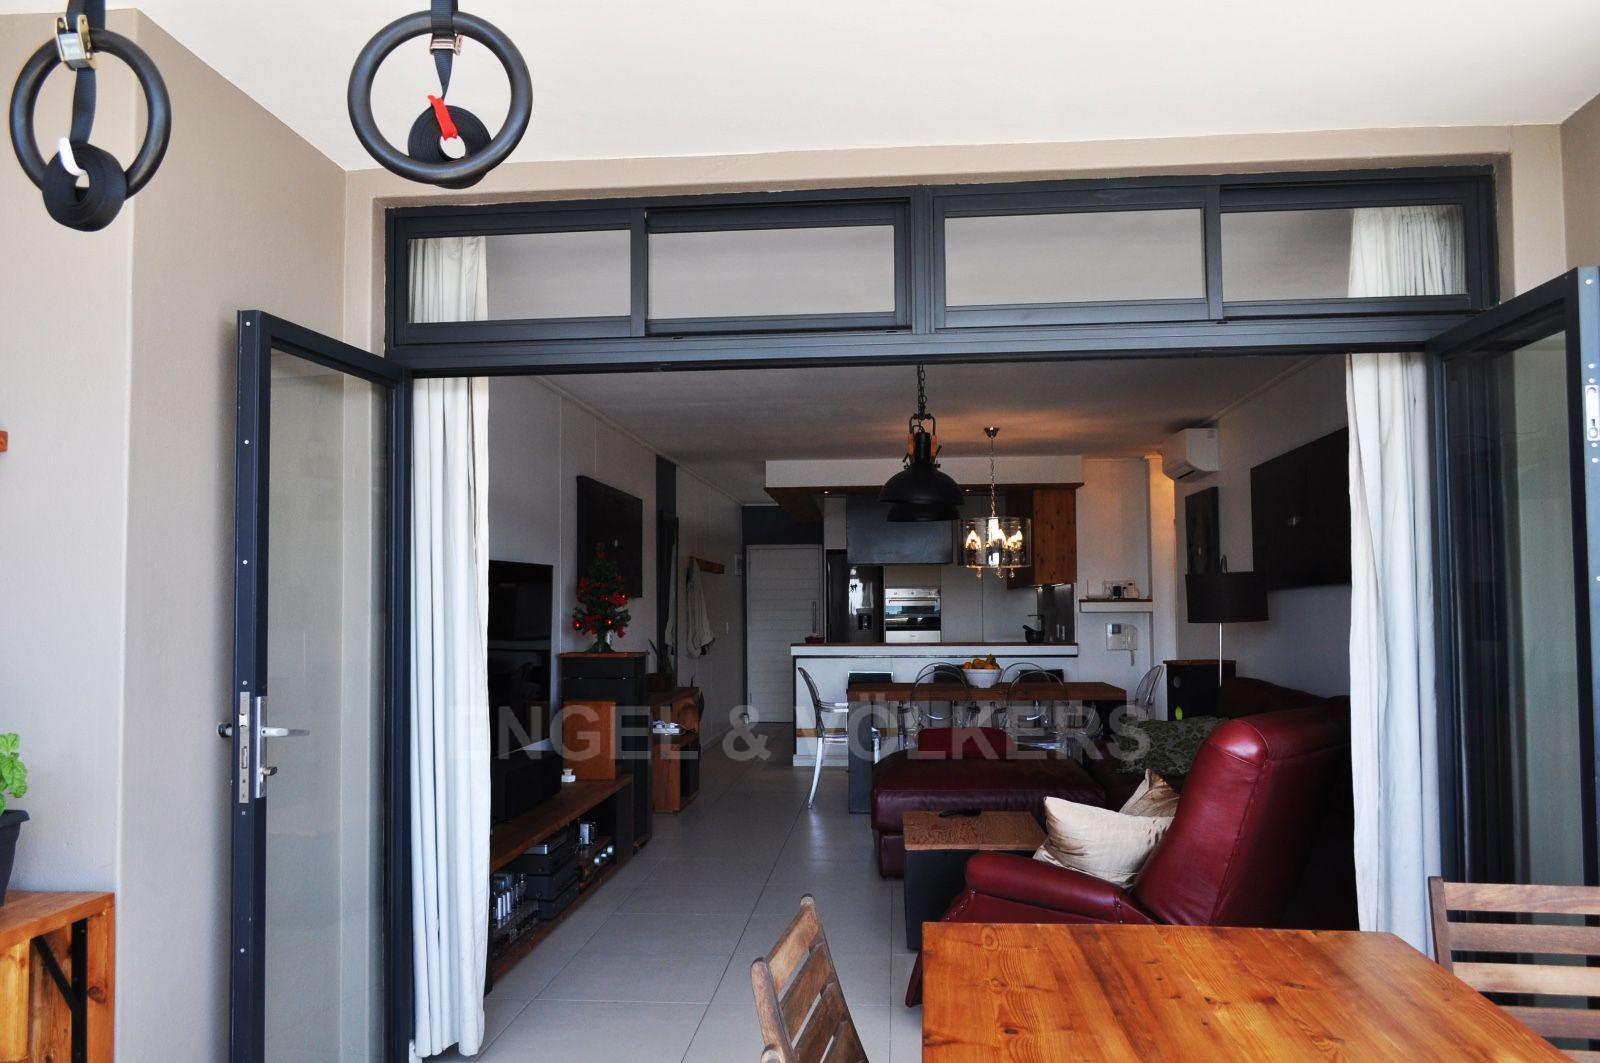 De Waterkant property for sale. Ref No: 13450081. Picture no 14